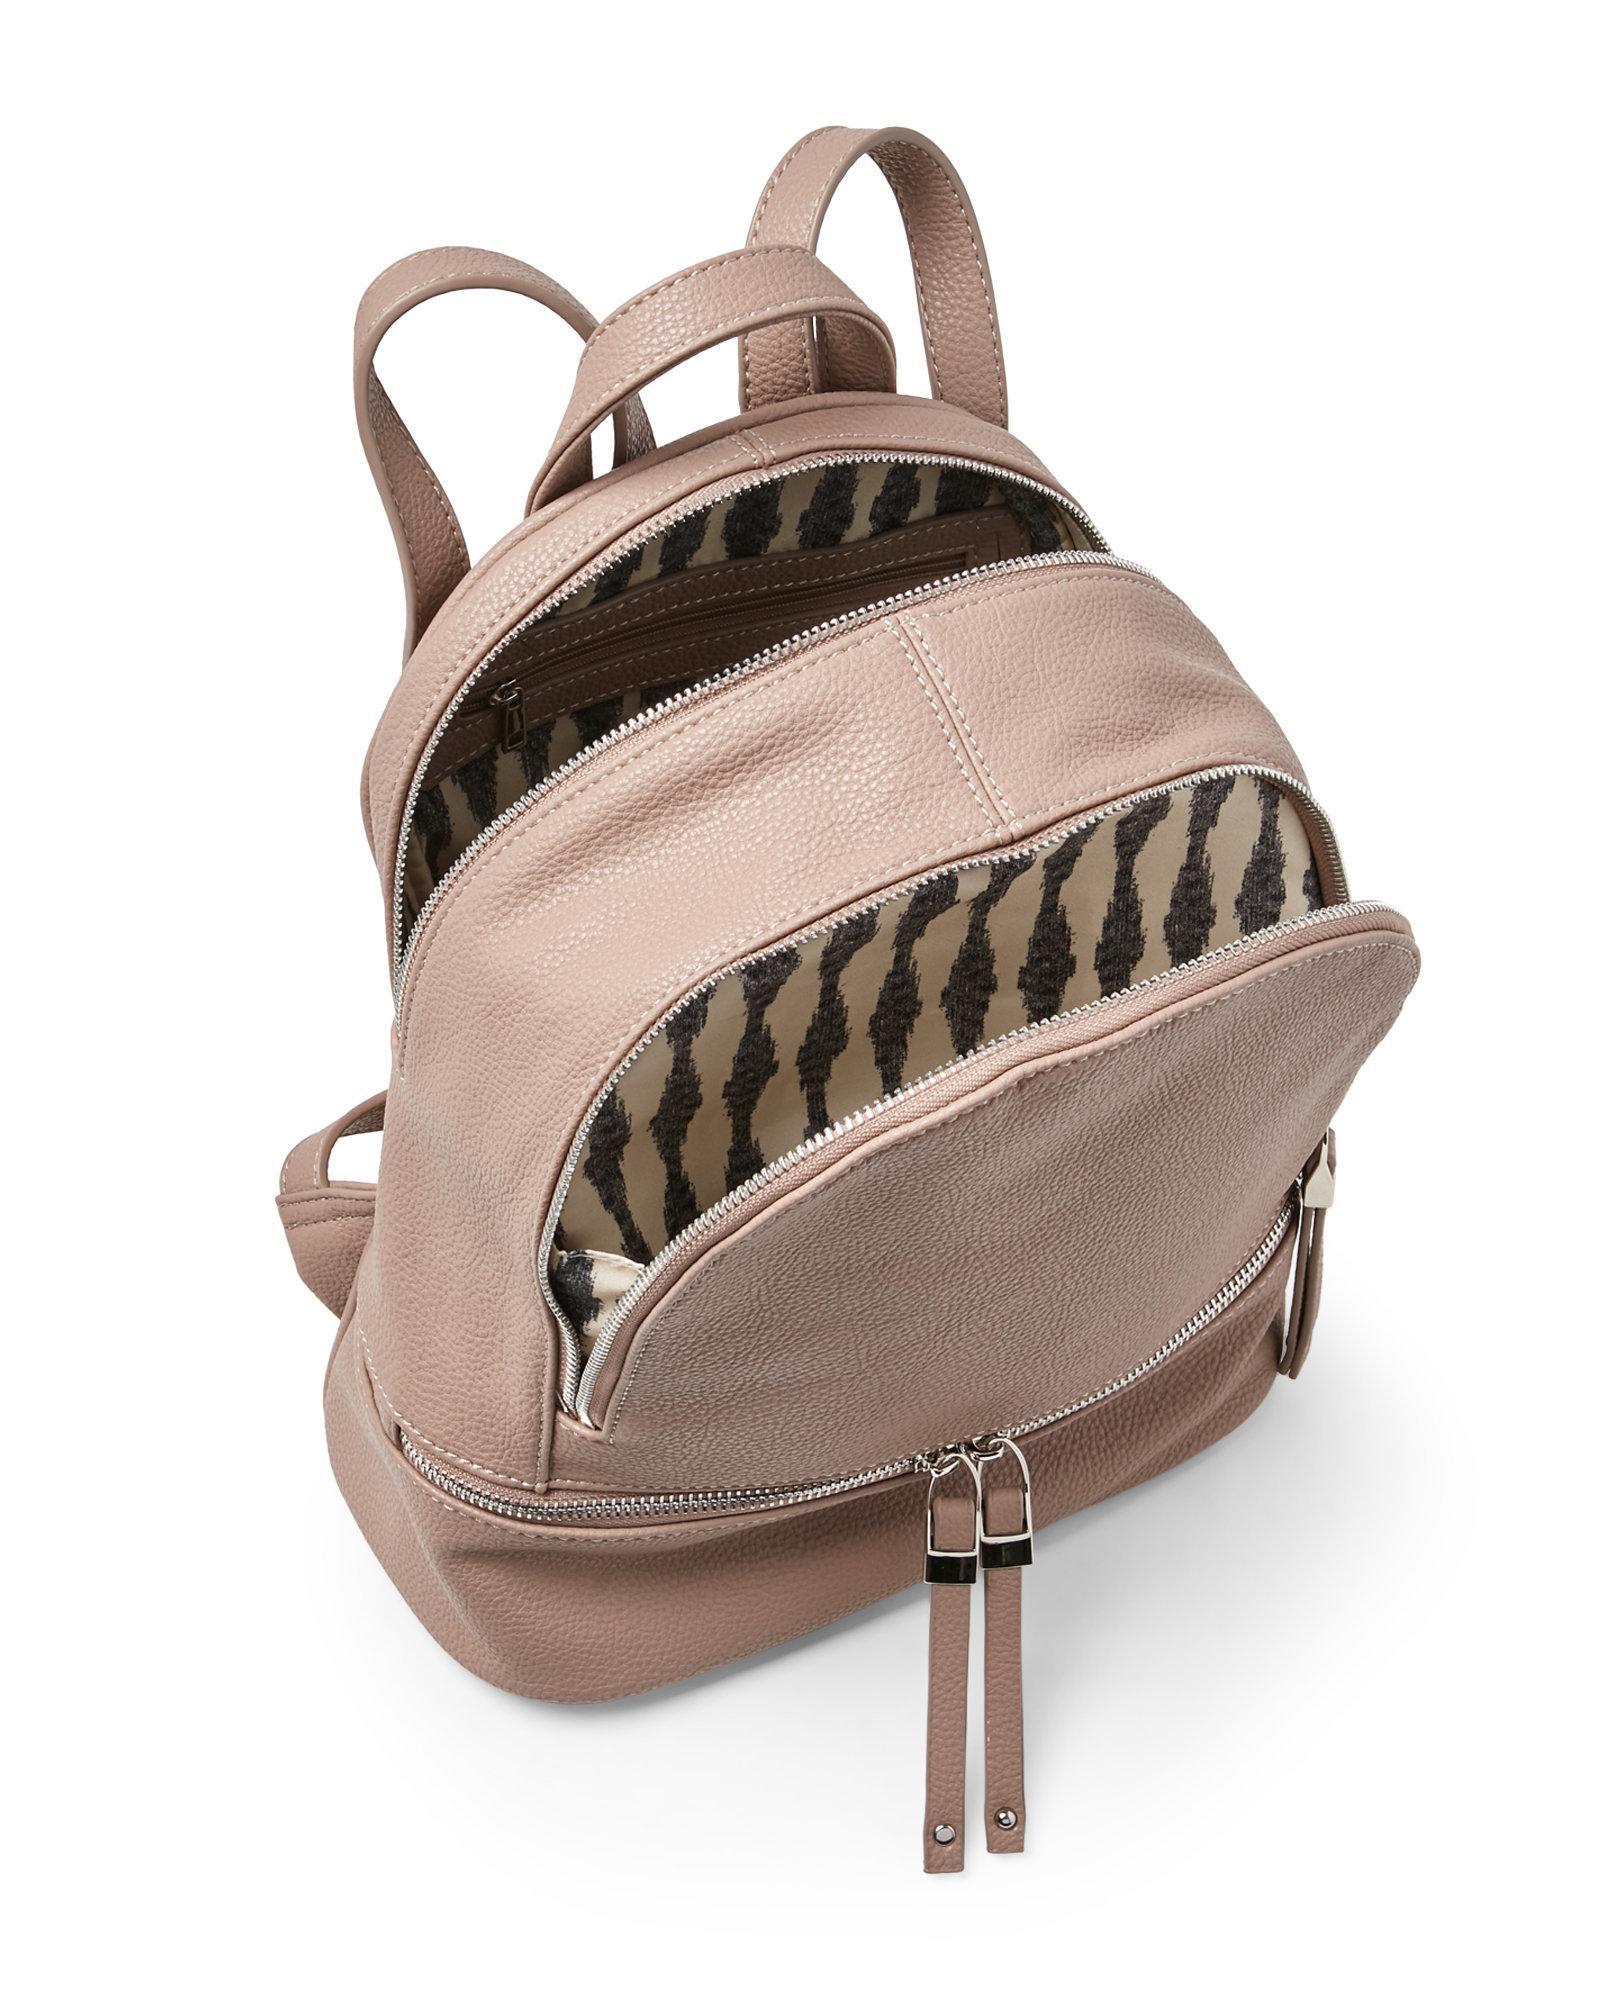 f3ae909365 Lyst - Urban Expressions Putty Ashleigh Backpack